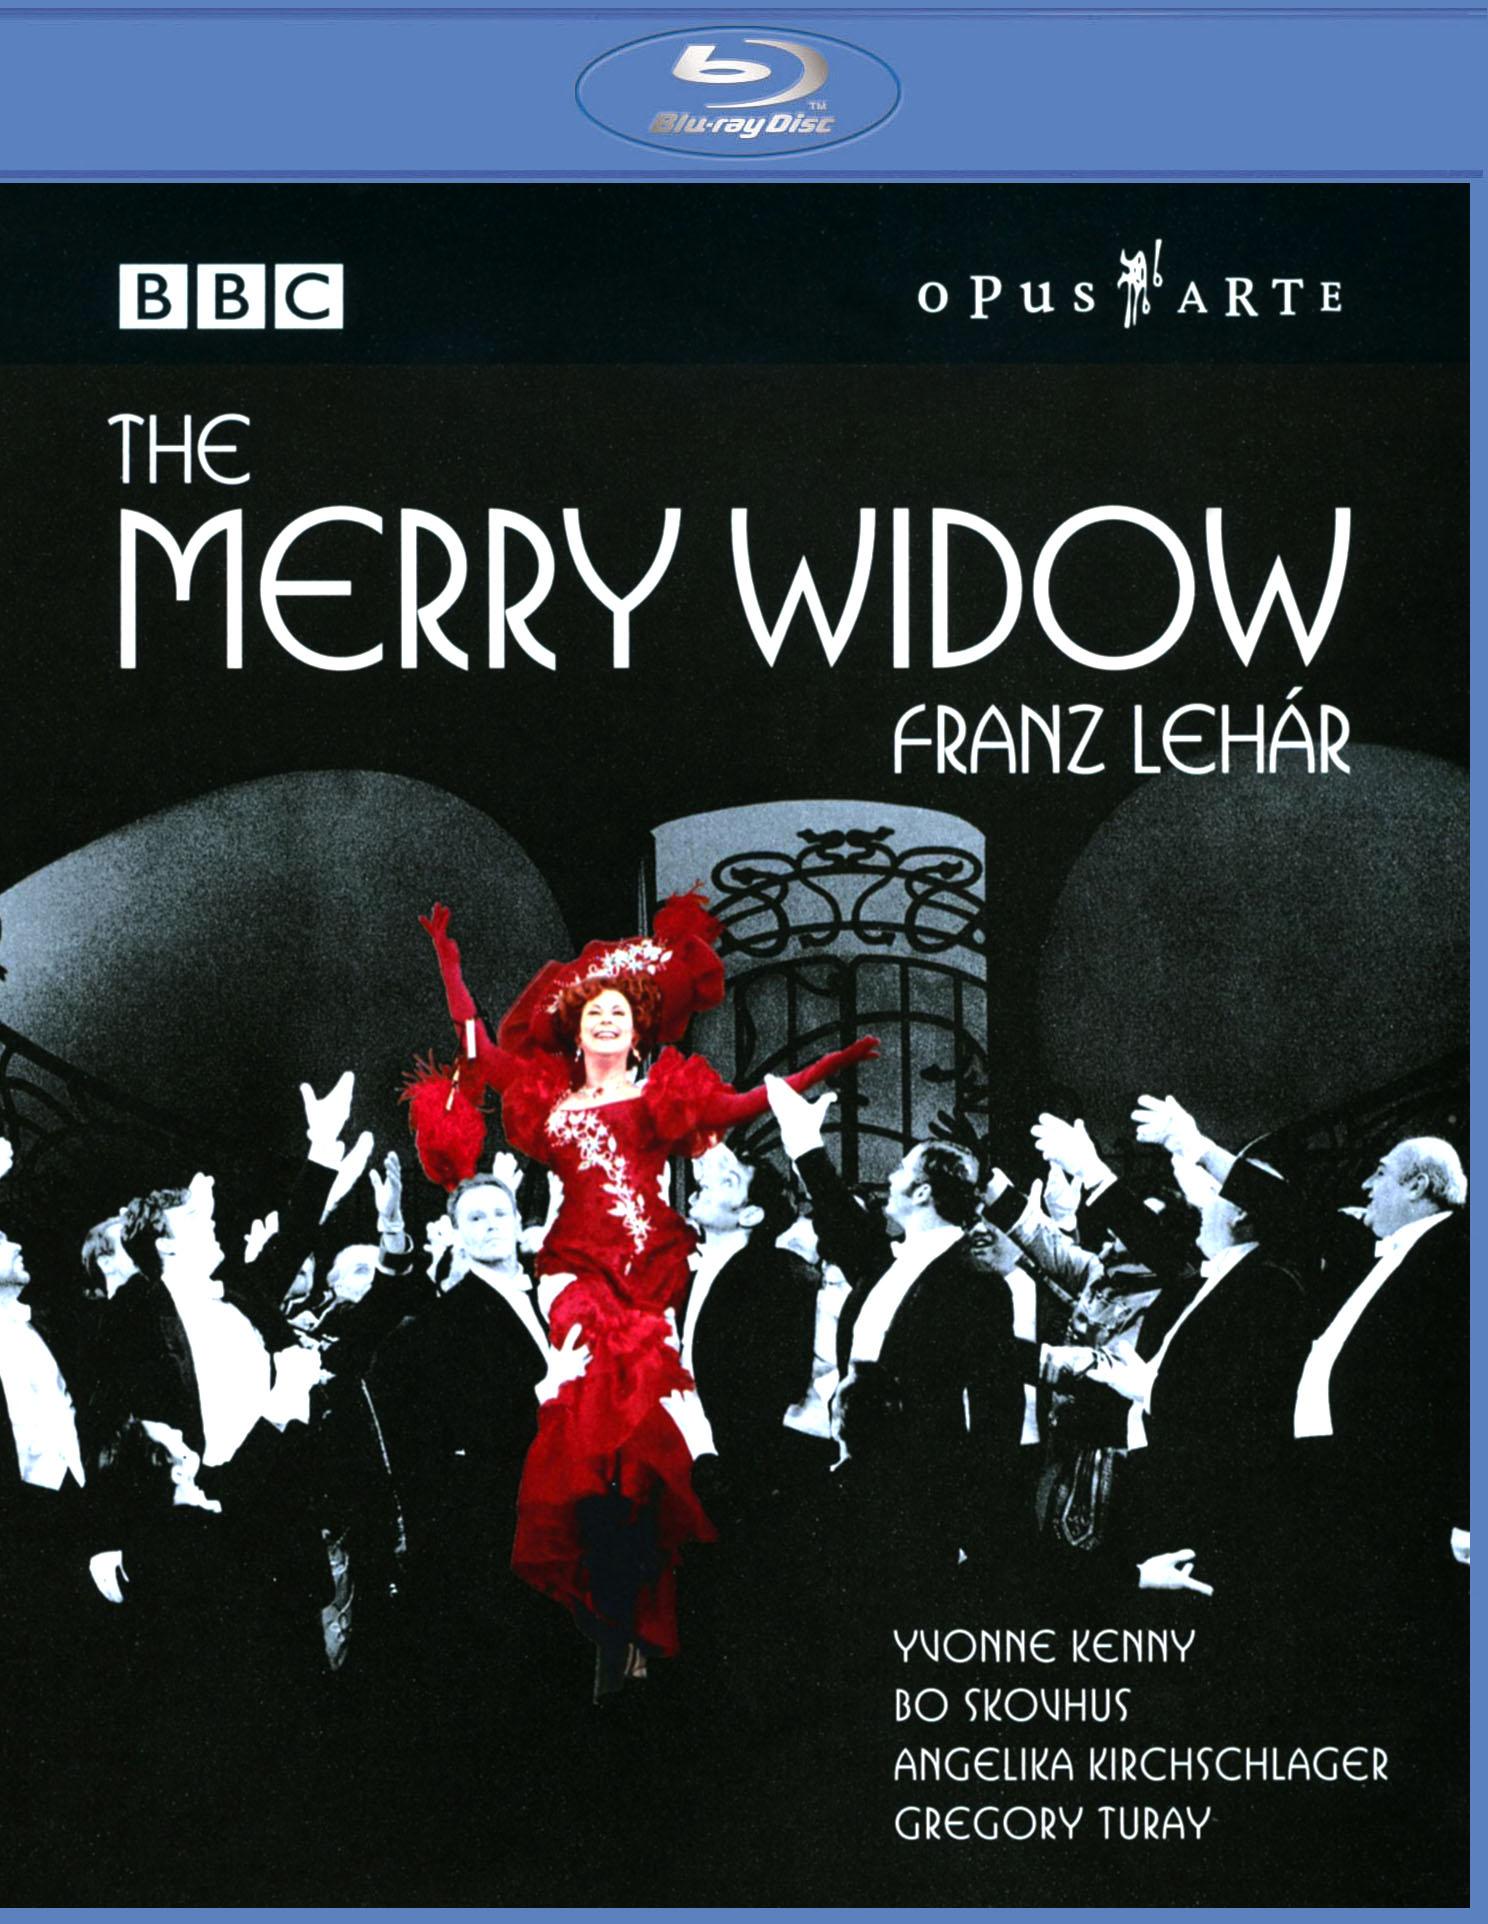 The Merry Widow (San Francisco Opera)